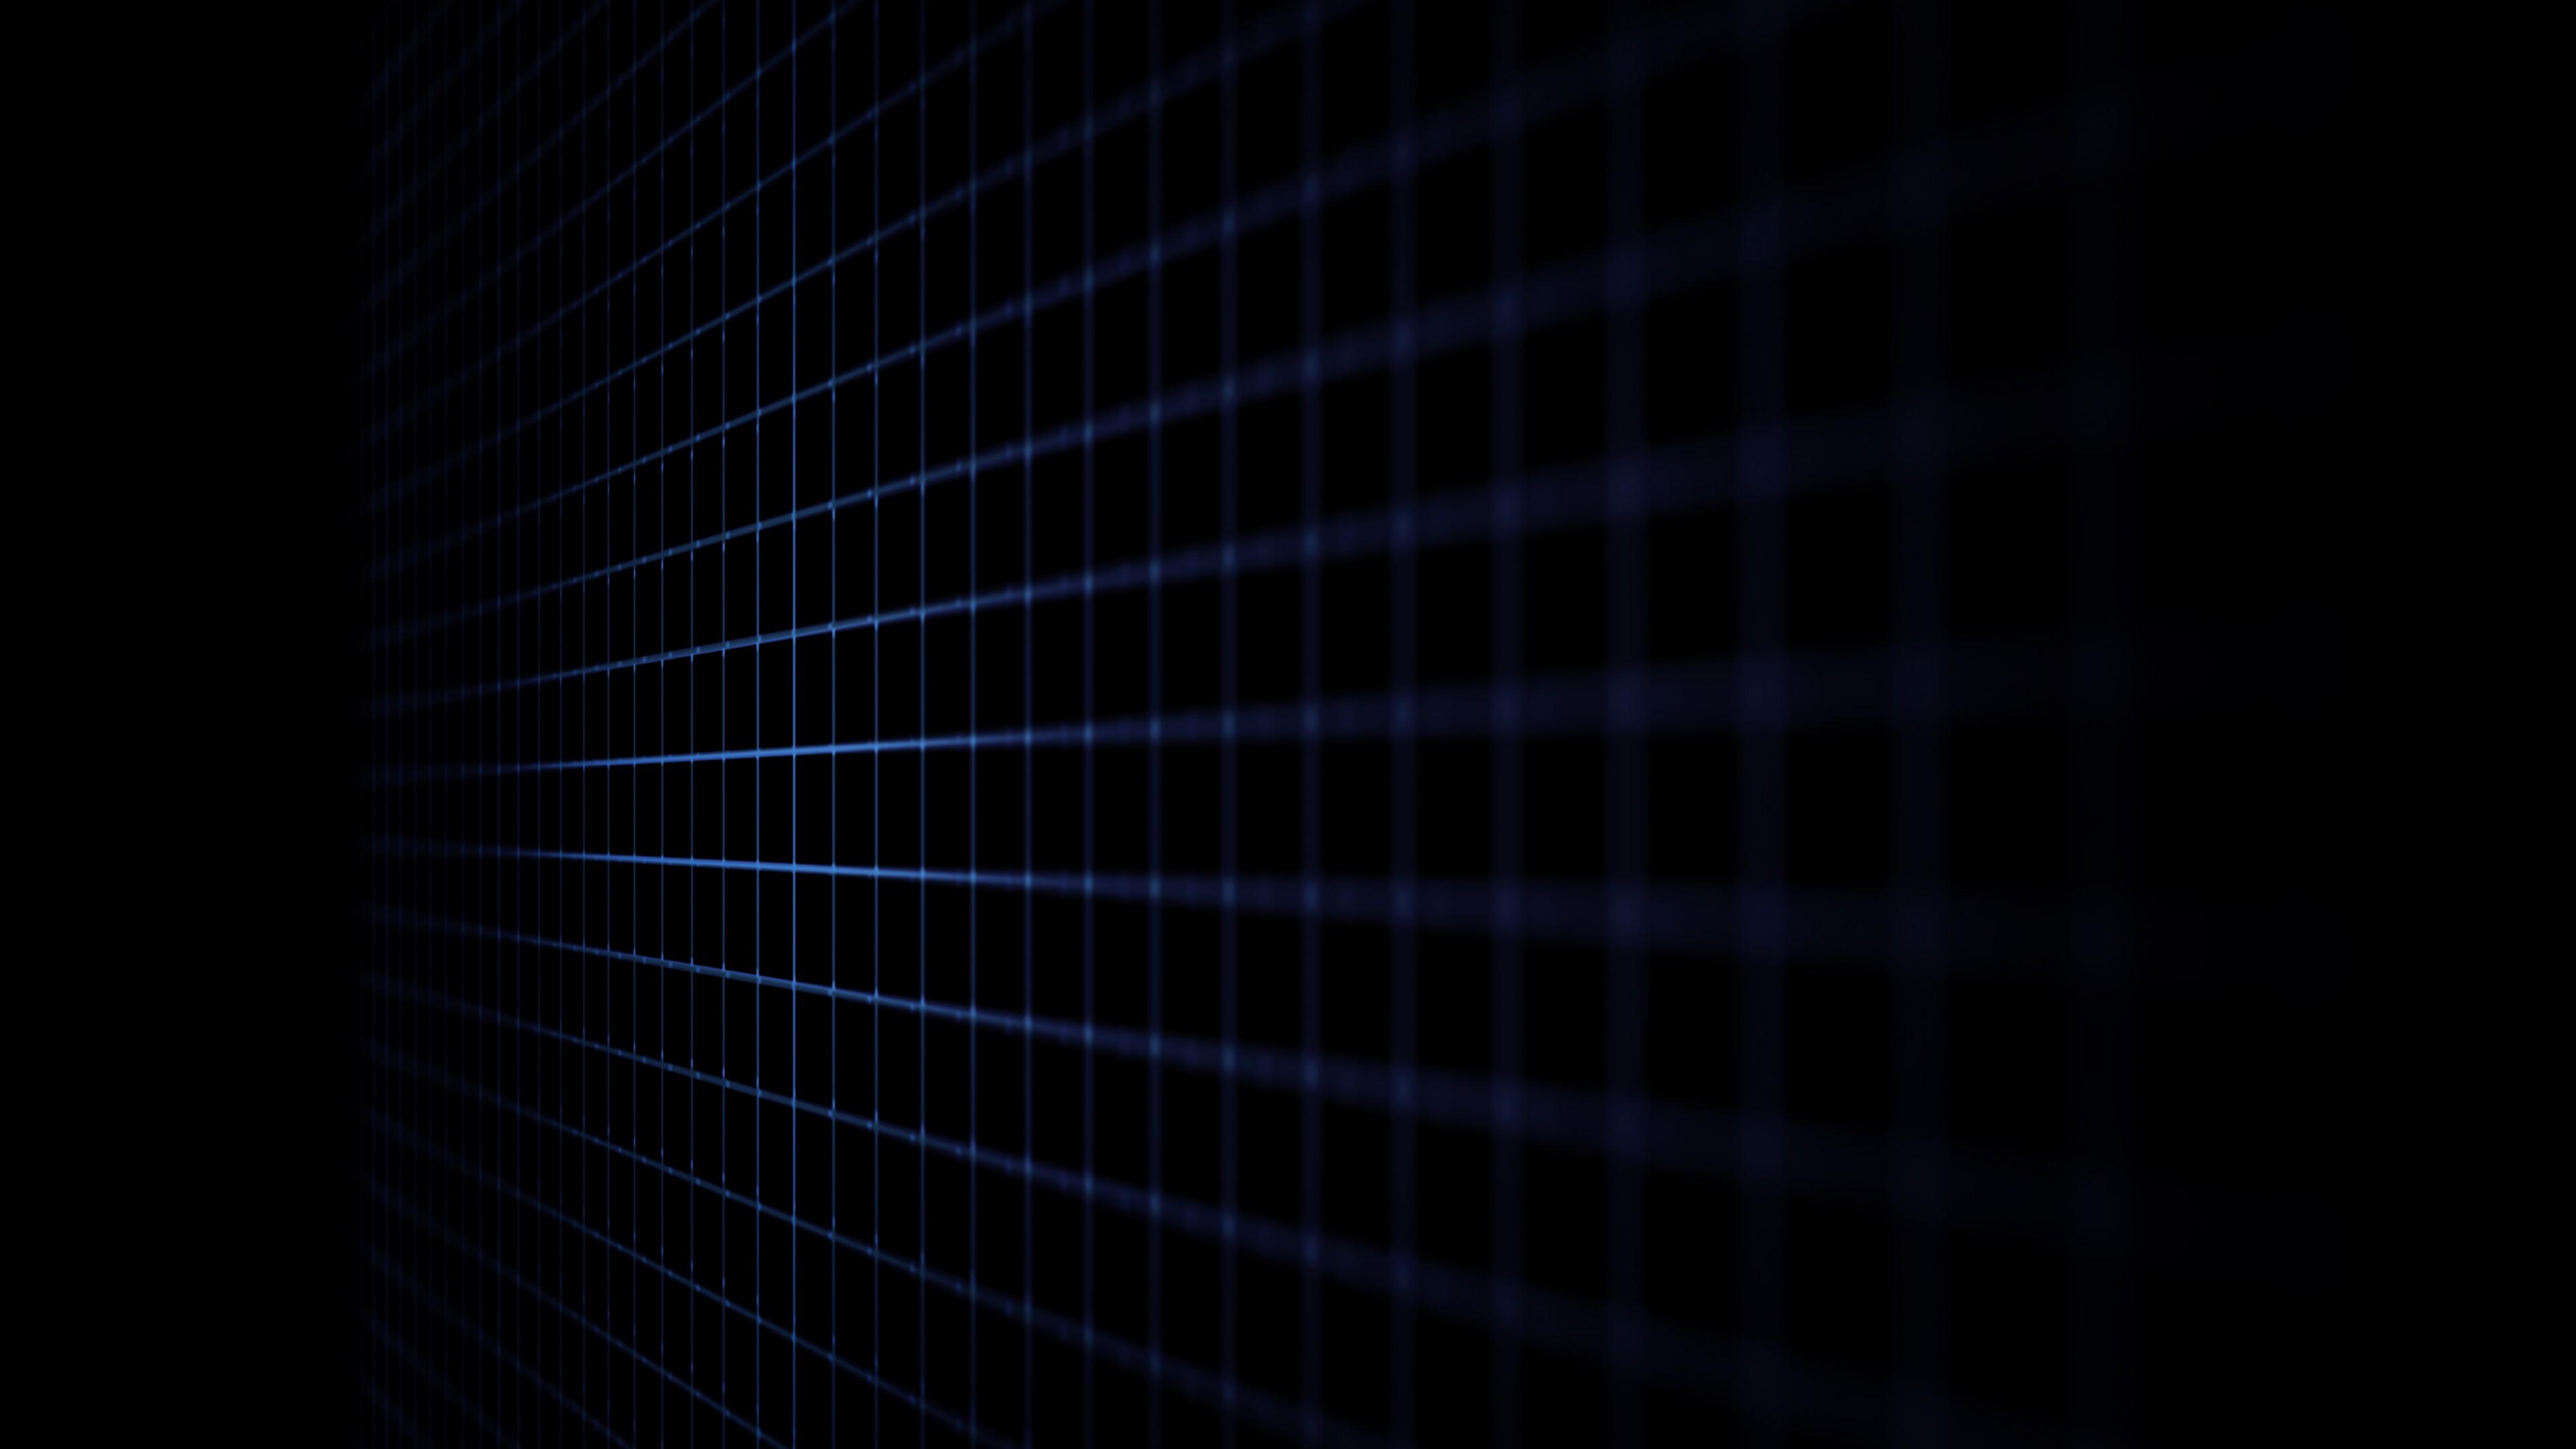 Wallpaper lines grid black 4k Abstract